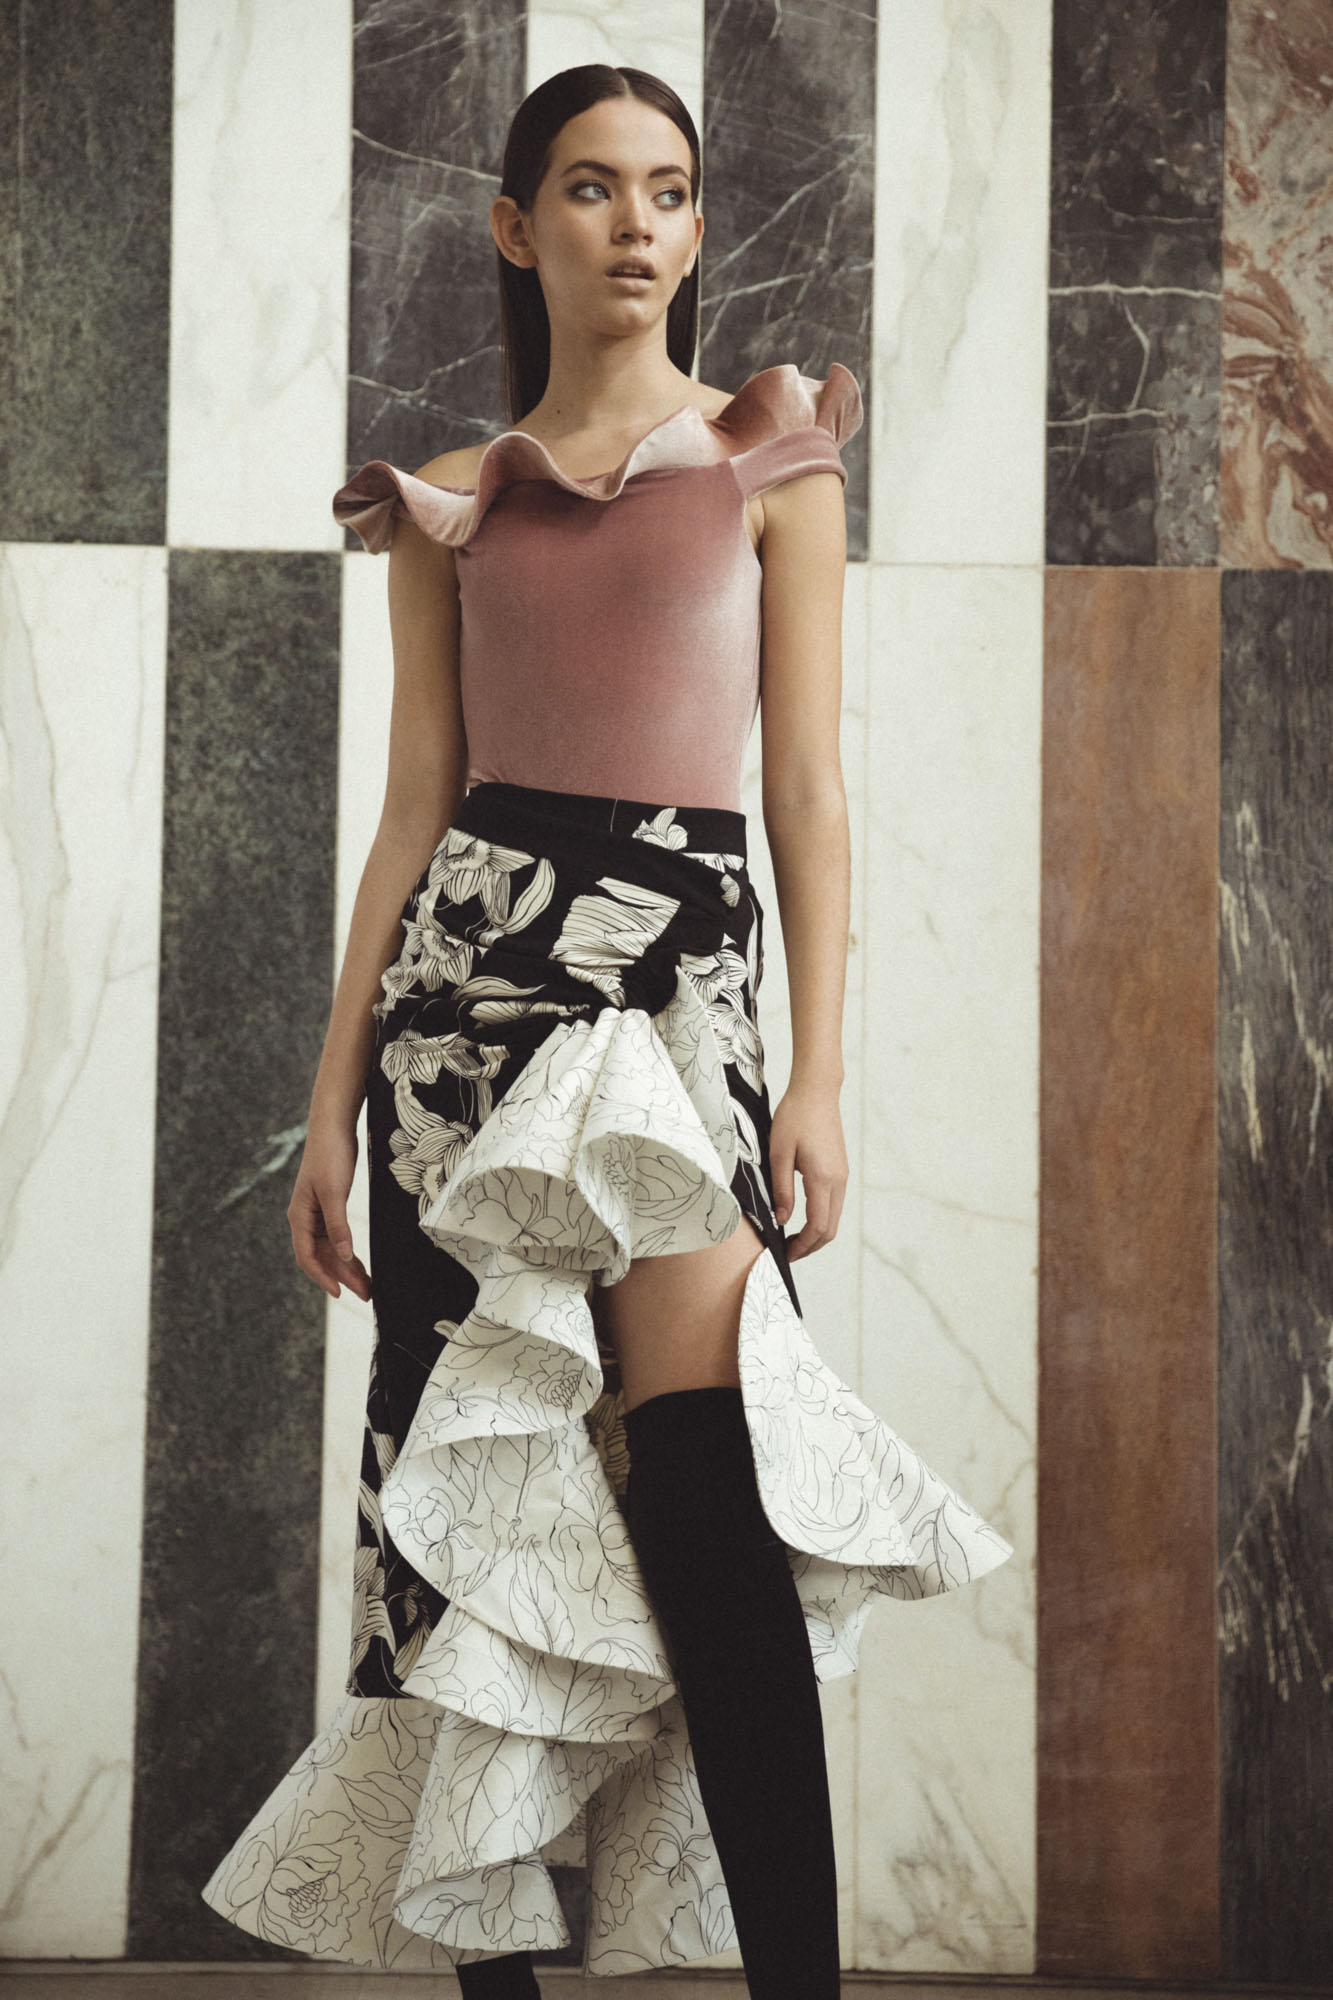 efrain_mogollon_femineus_pamela_ bodysuit - _tulip_ wrap skirt  (1).JPG